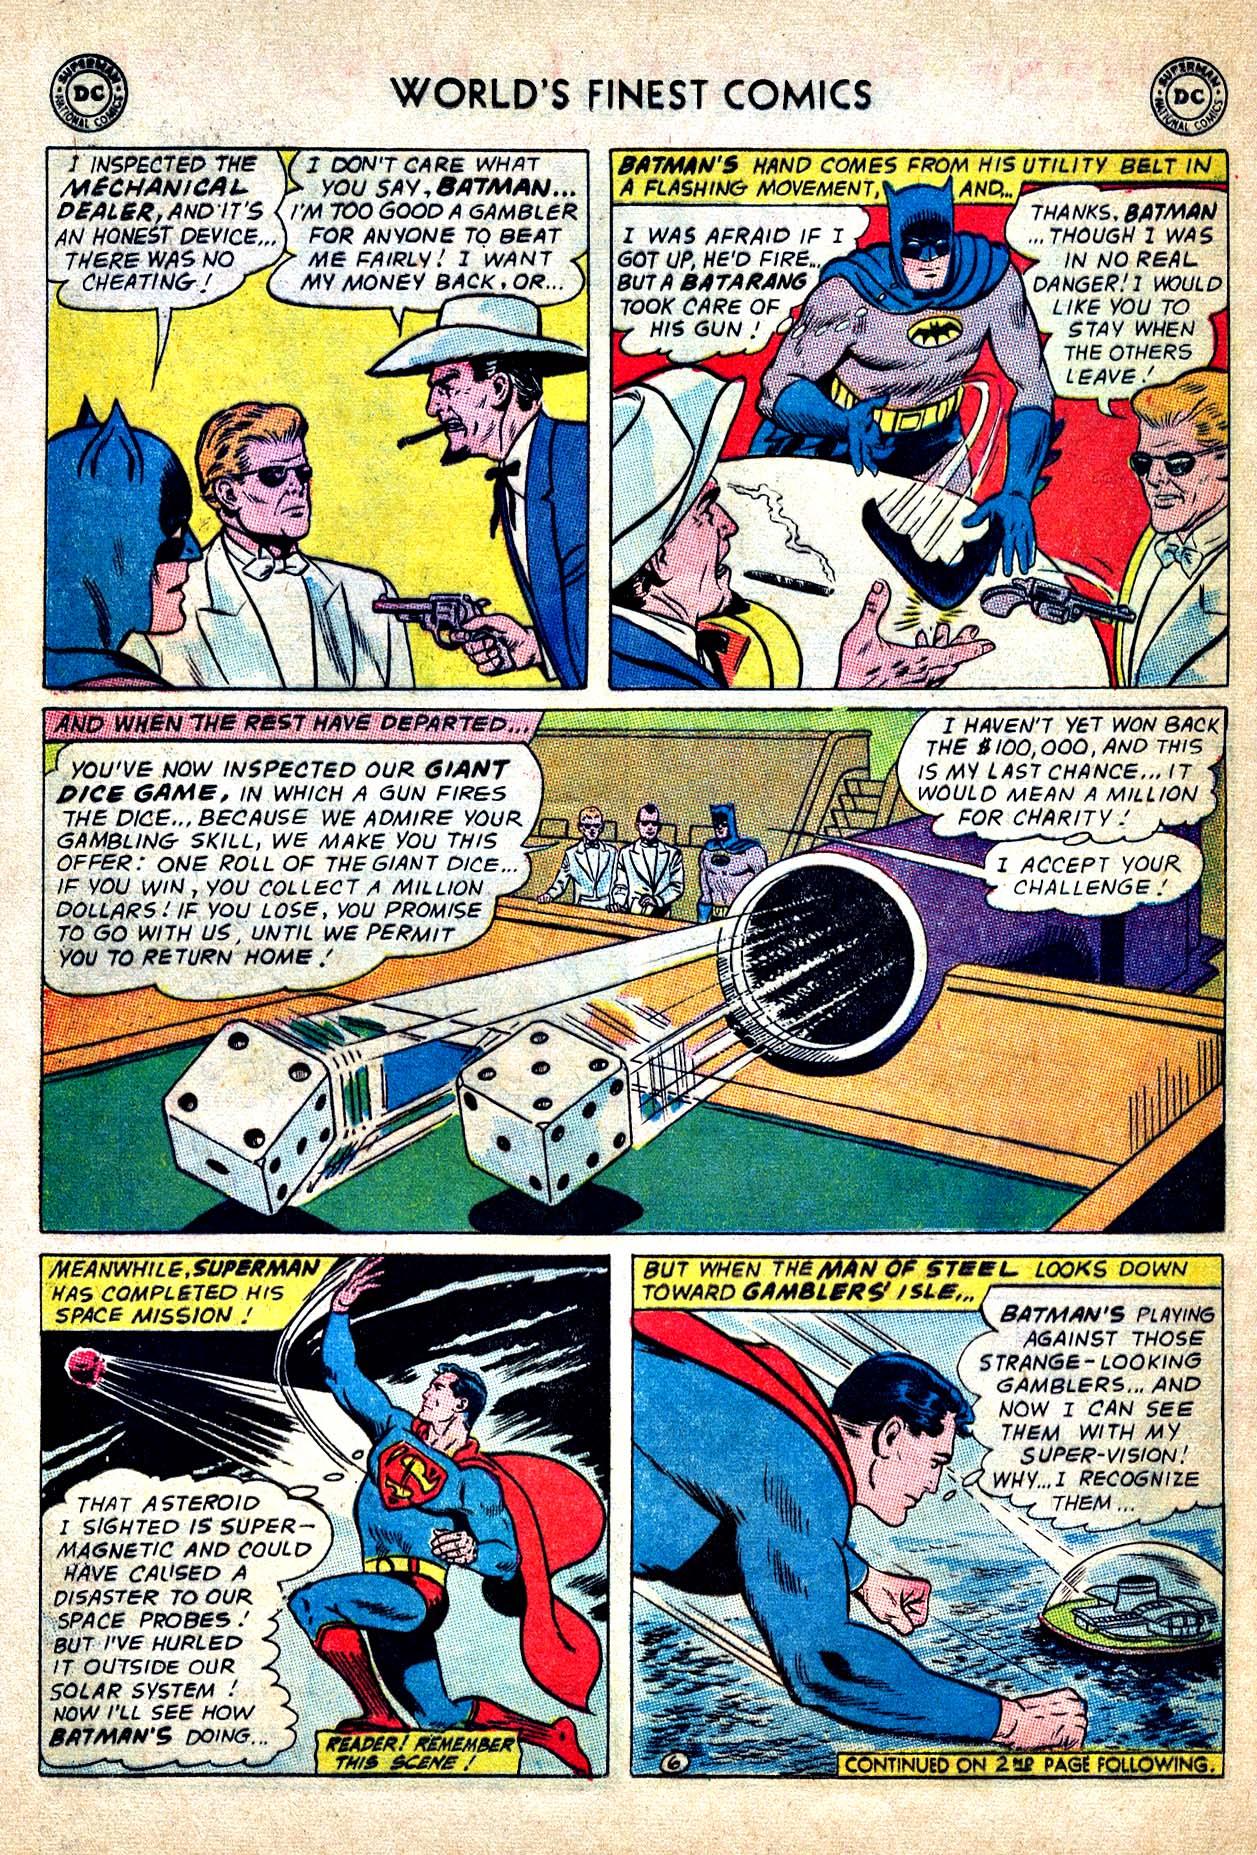 Read online World's Finest Comics comic -  Issue #150 - 8